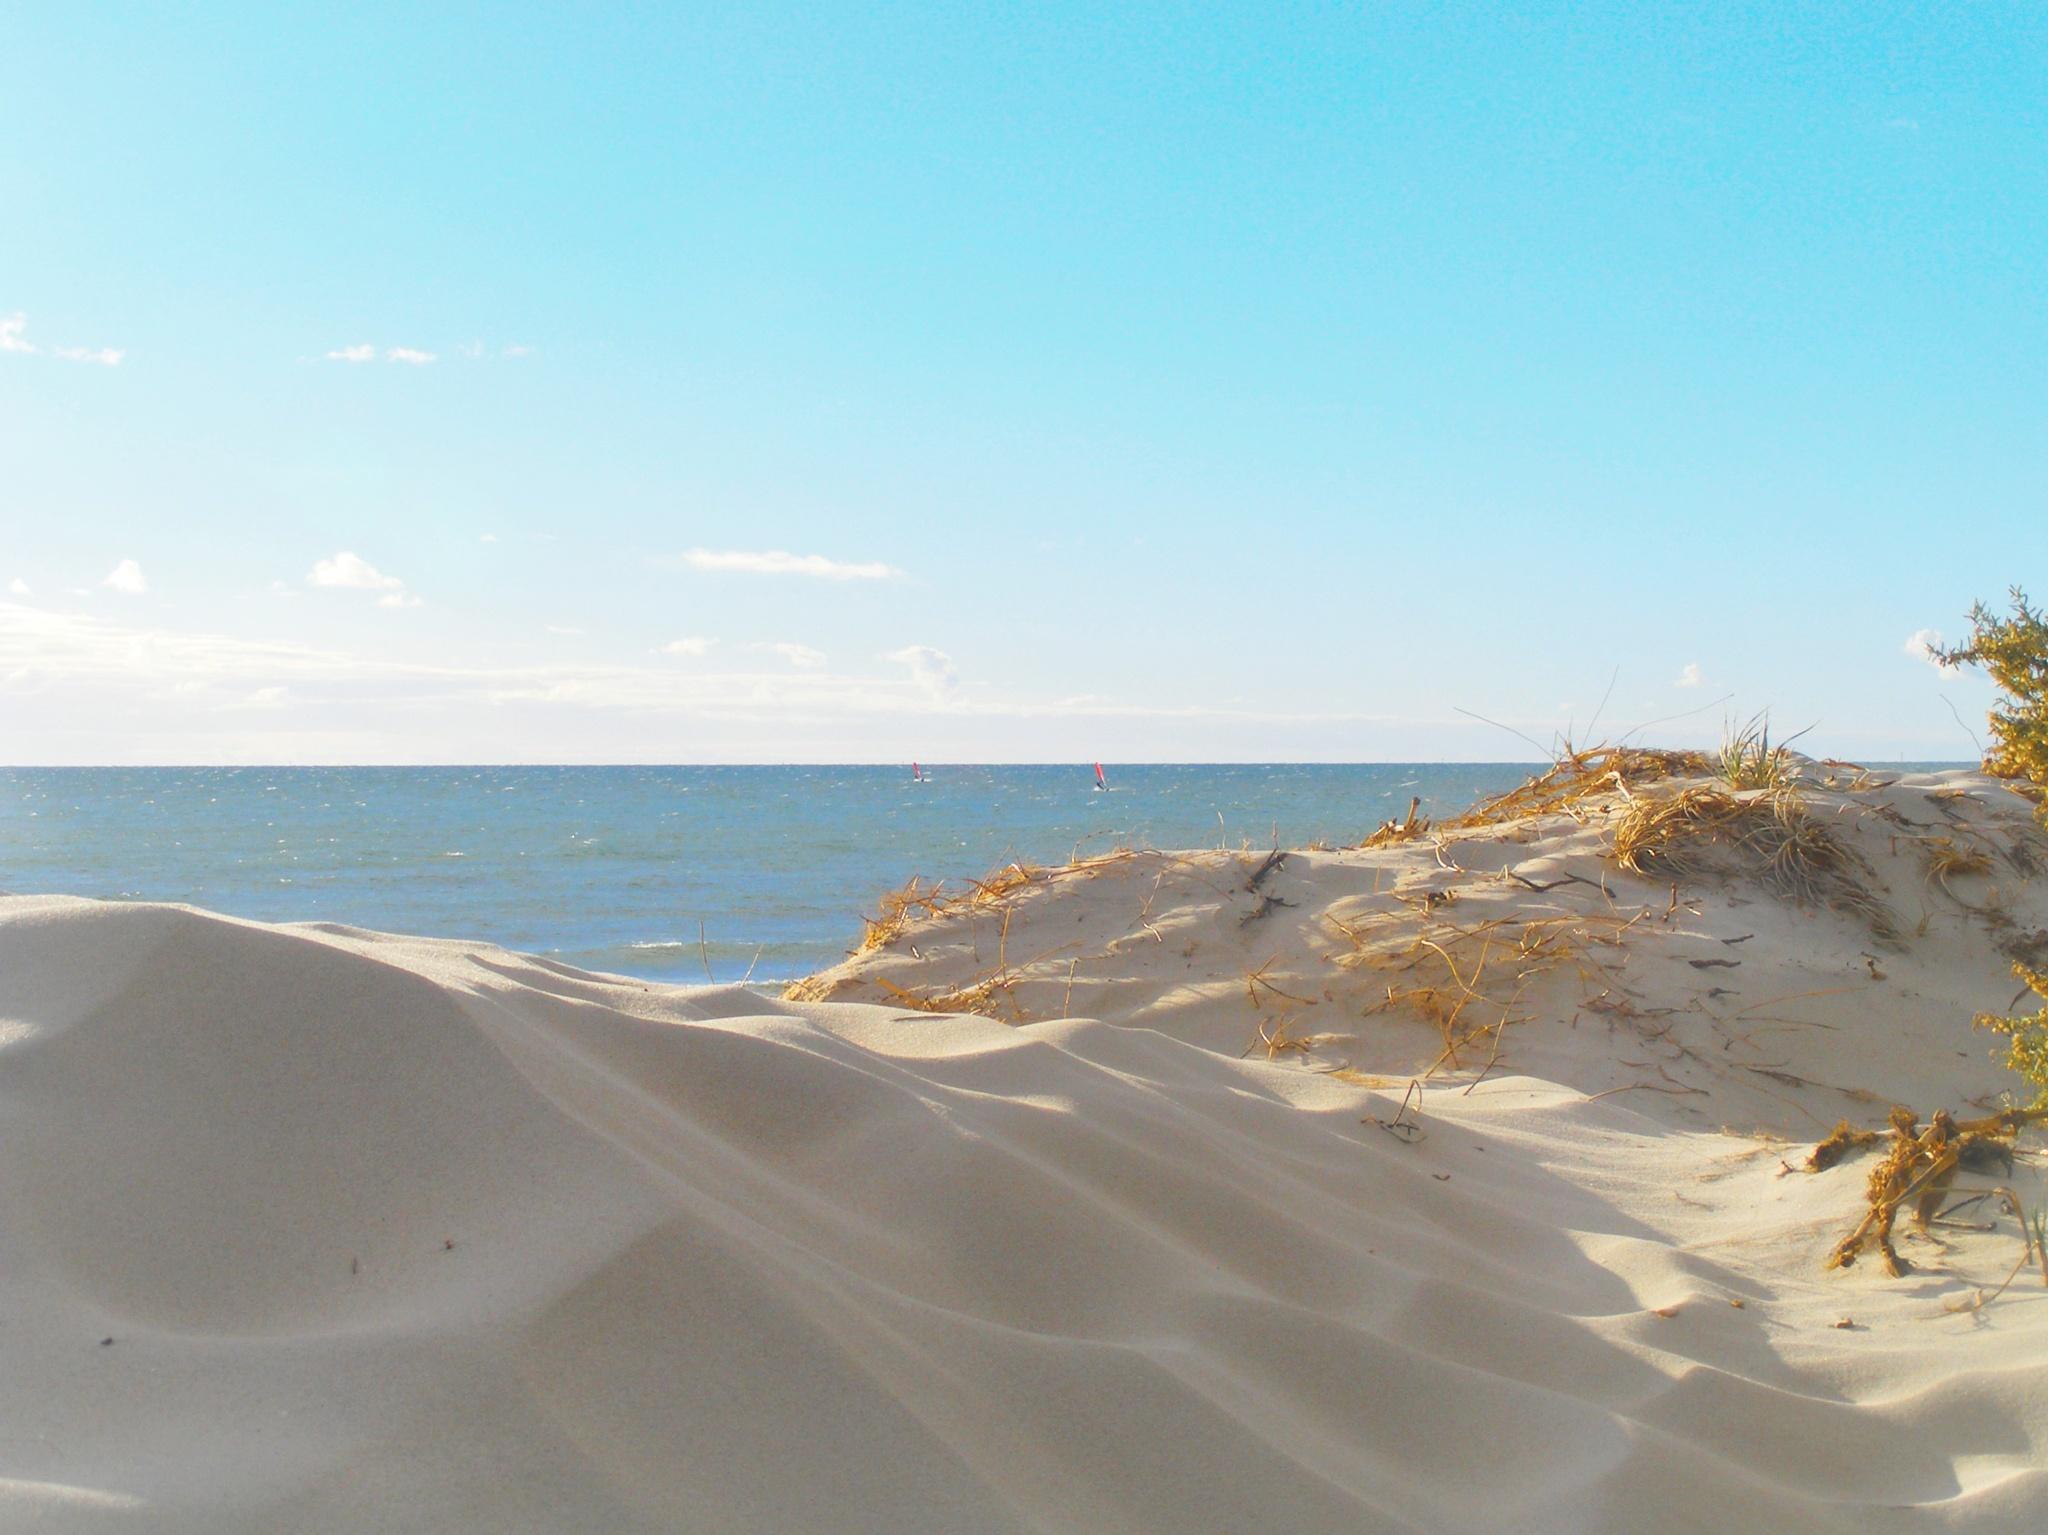 Sandy Beach by elisero300